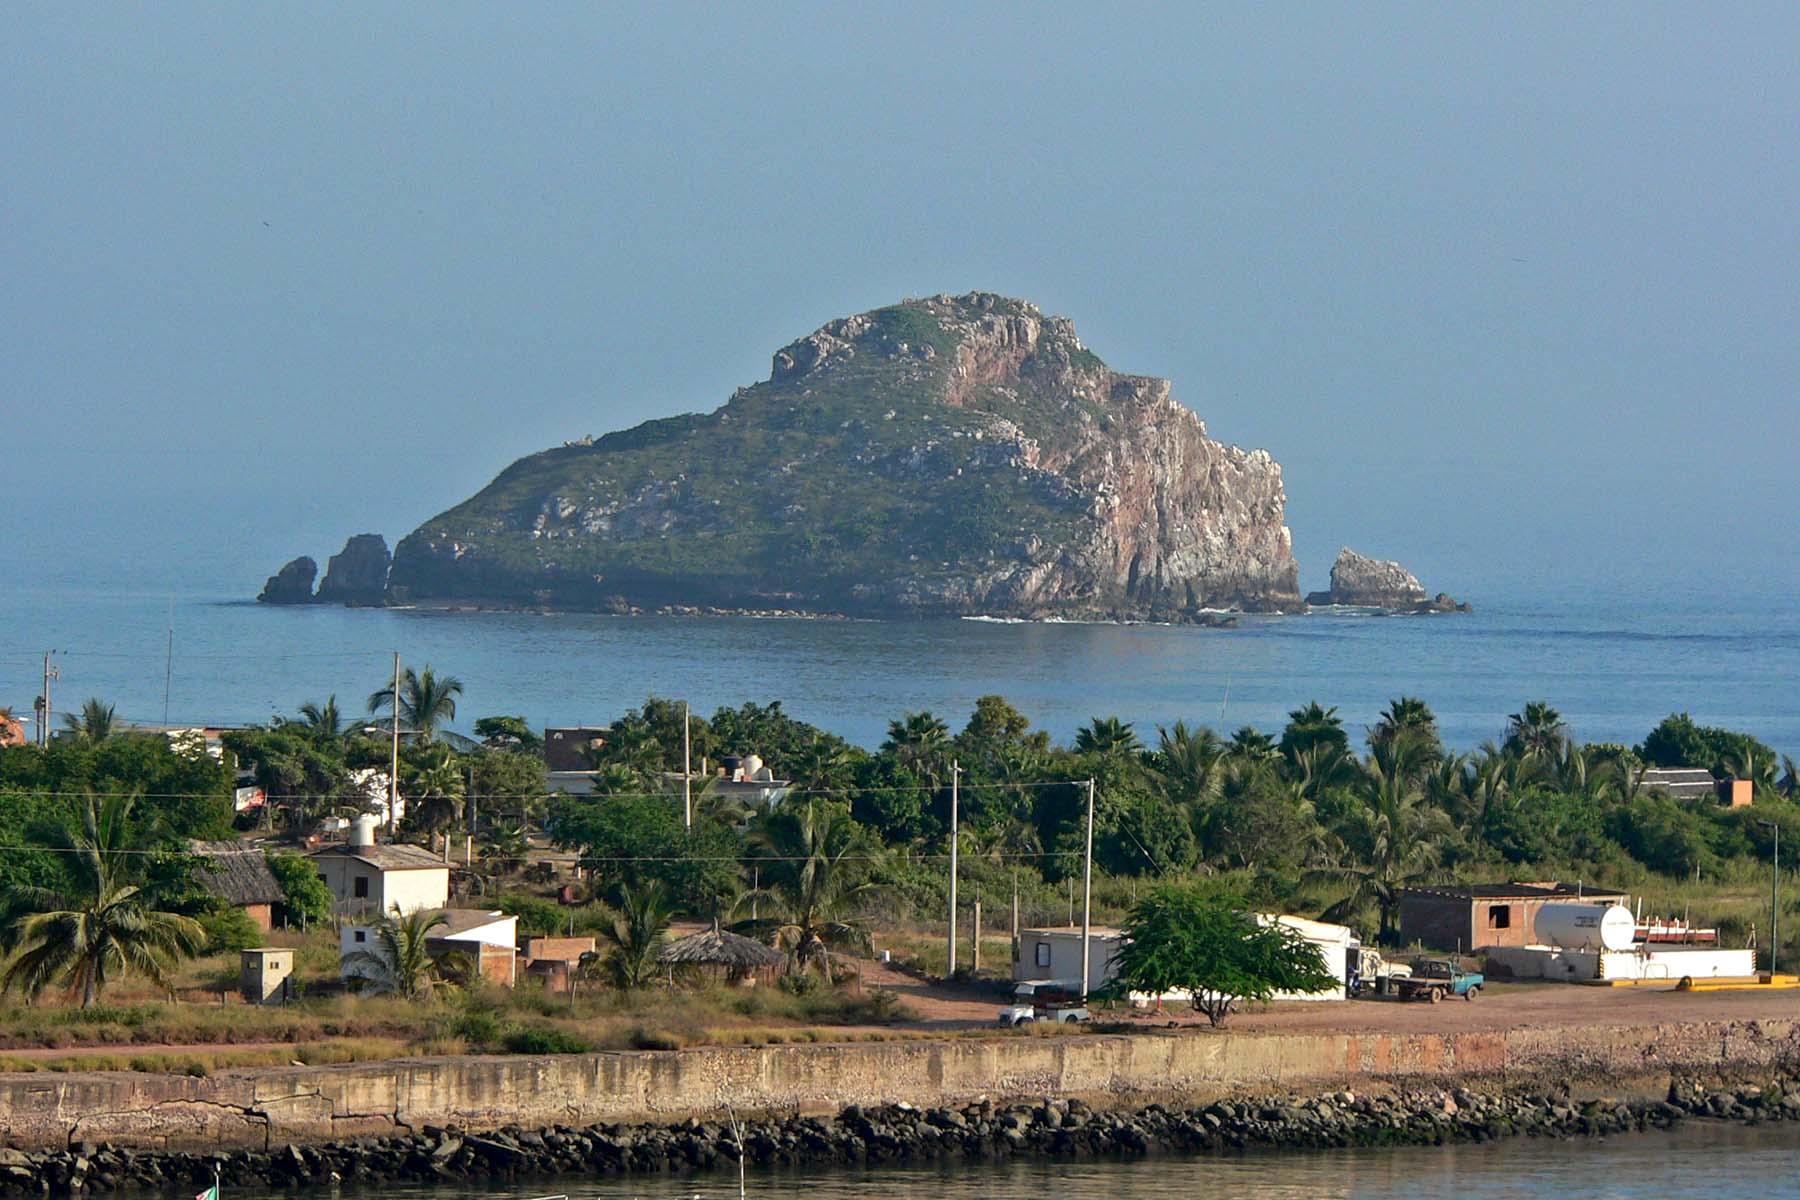 File:Isla Cordones.jpg - Wikimedia Commons